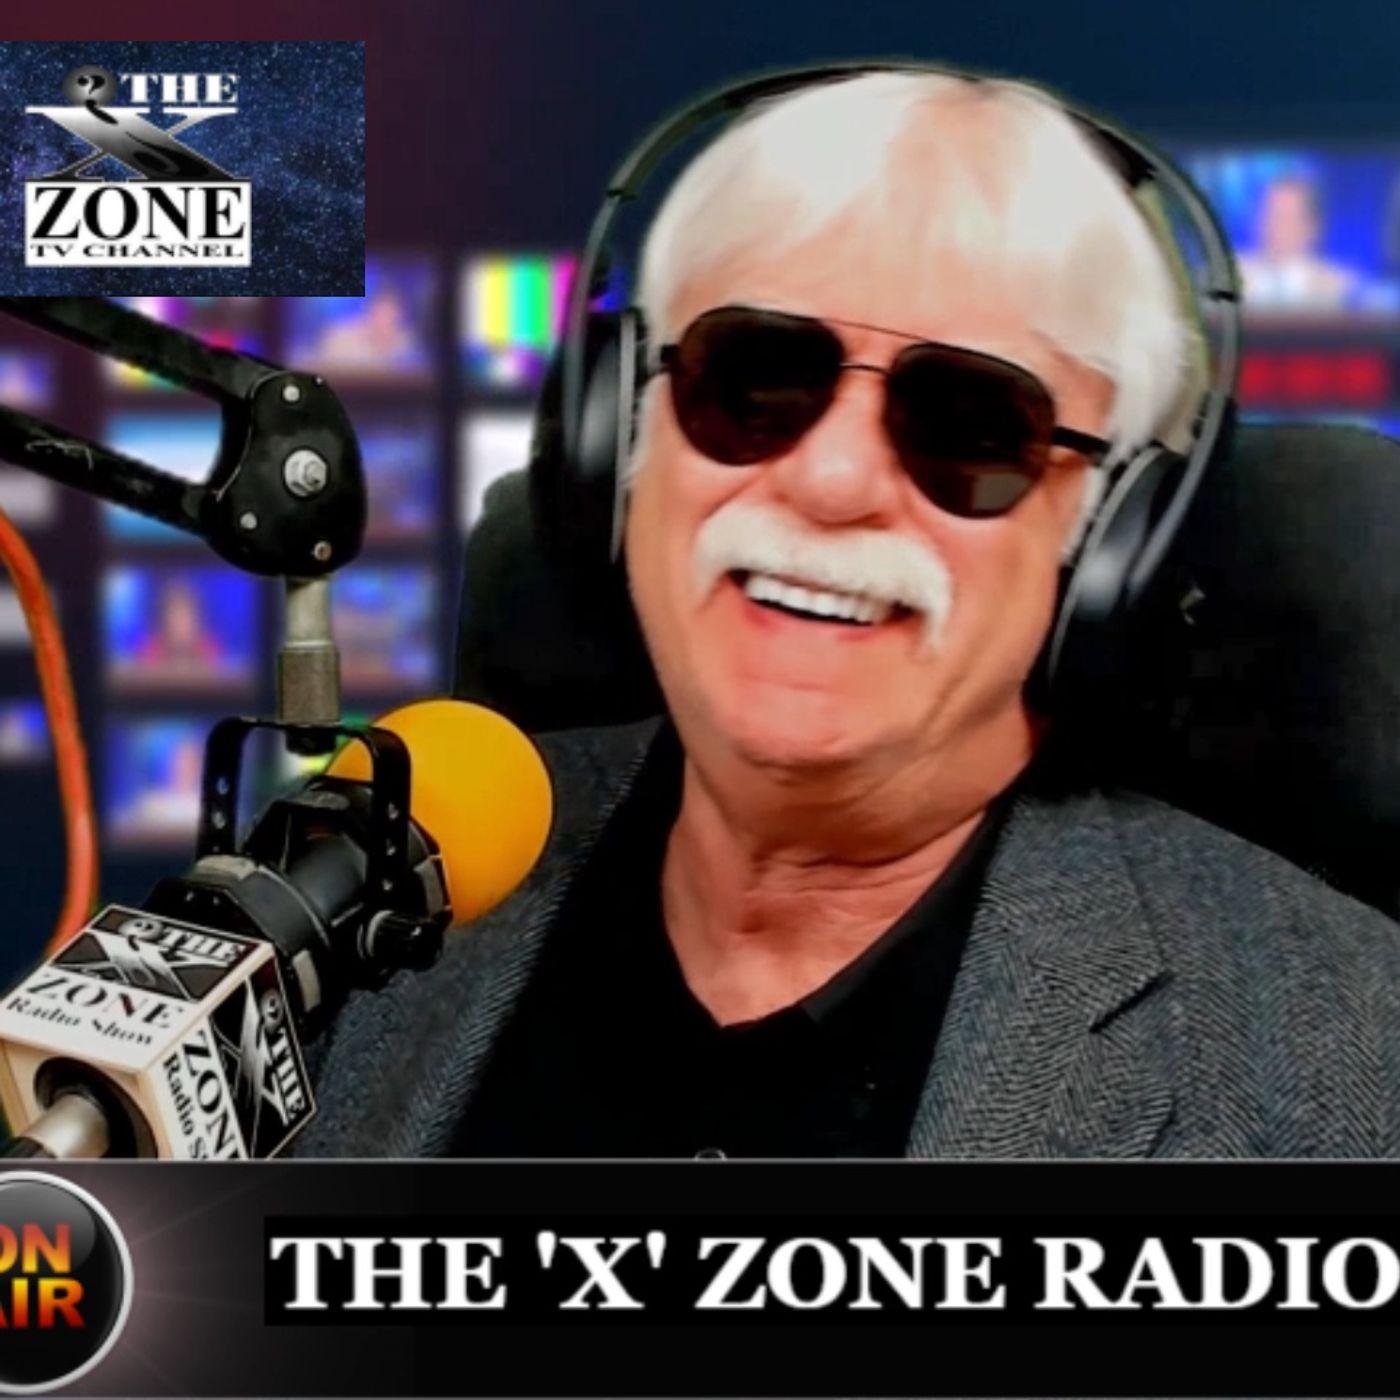 XZRS: Dale Kaczmarek - Ghost Research Society